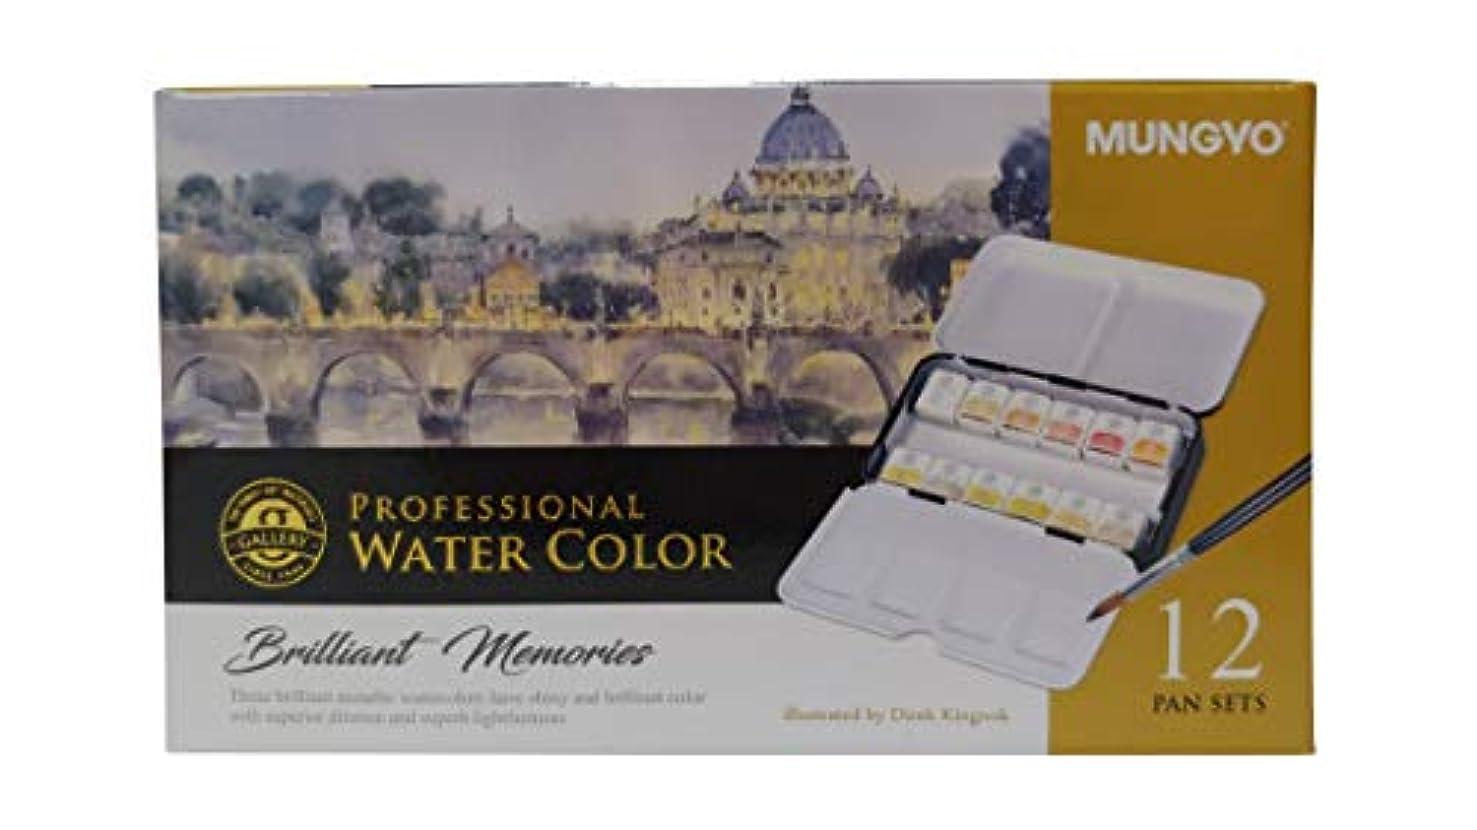 MUNGYO Professional Watercolor Set, Tin Case, 12 Colors, Metallic Colors